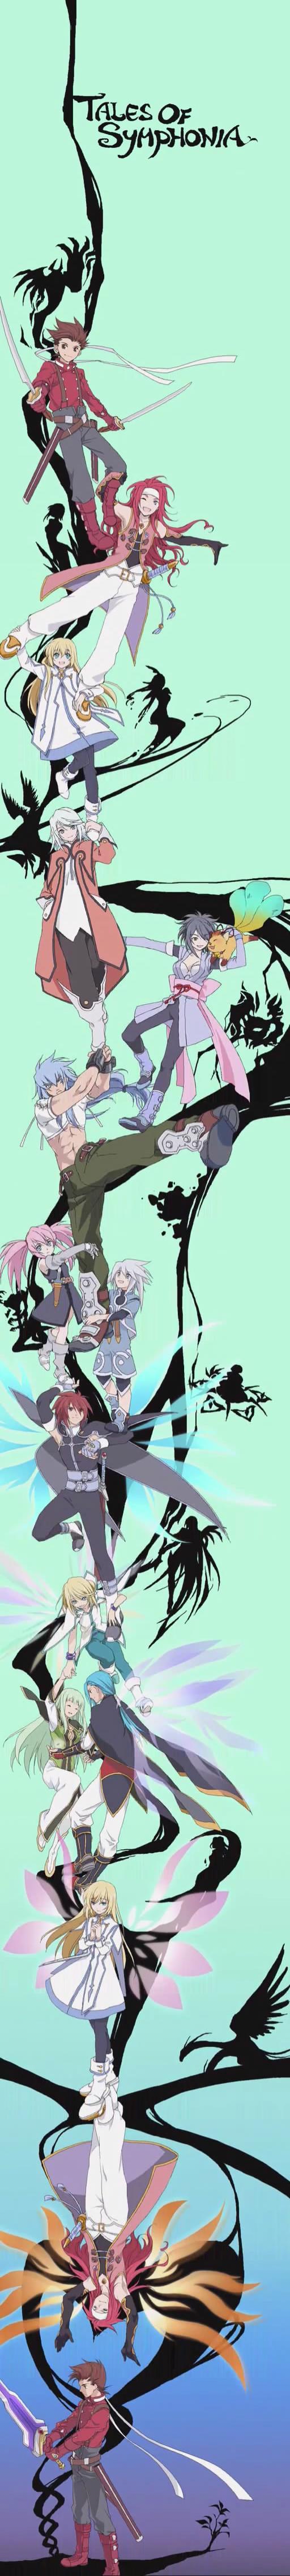 Tags: Anime, Tales of Symphonia, Presea Combatir, Yuan Ka-Fai, Raine Sage, Lloyd Irving, Mithos Yggdrasill, Genis Sage, Kratos Aurion, Corrine, Colette Brunel, Regal Bryant, Sheena Fujibayashi, Tales Of Symphonia: Dawn Of The New World